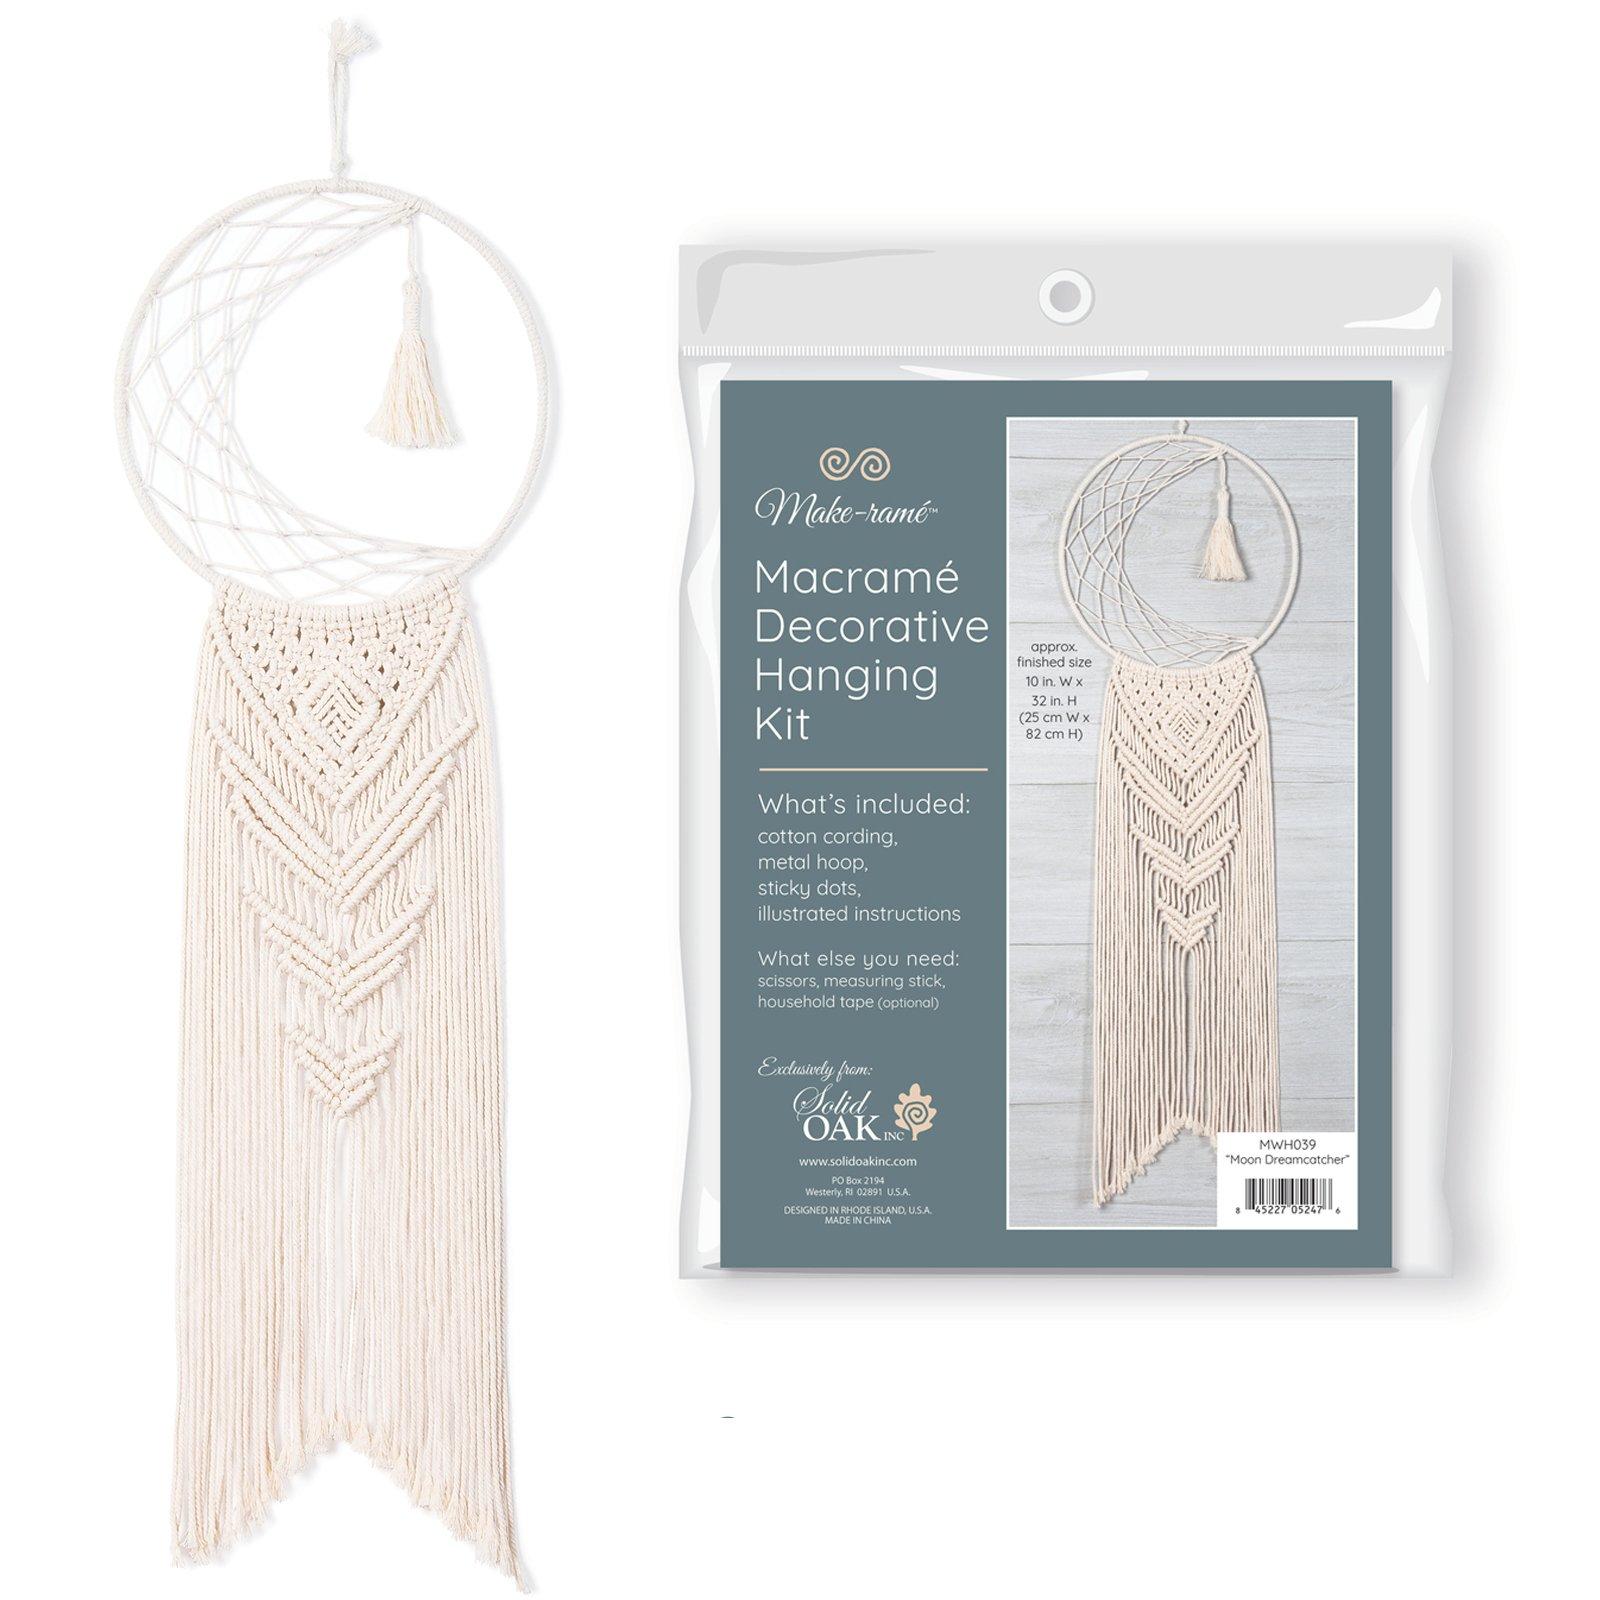 Moon Dreamcatcher Macrame Wall Hanging Kit